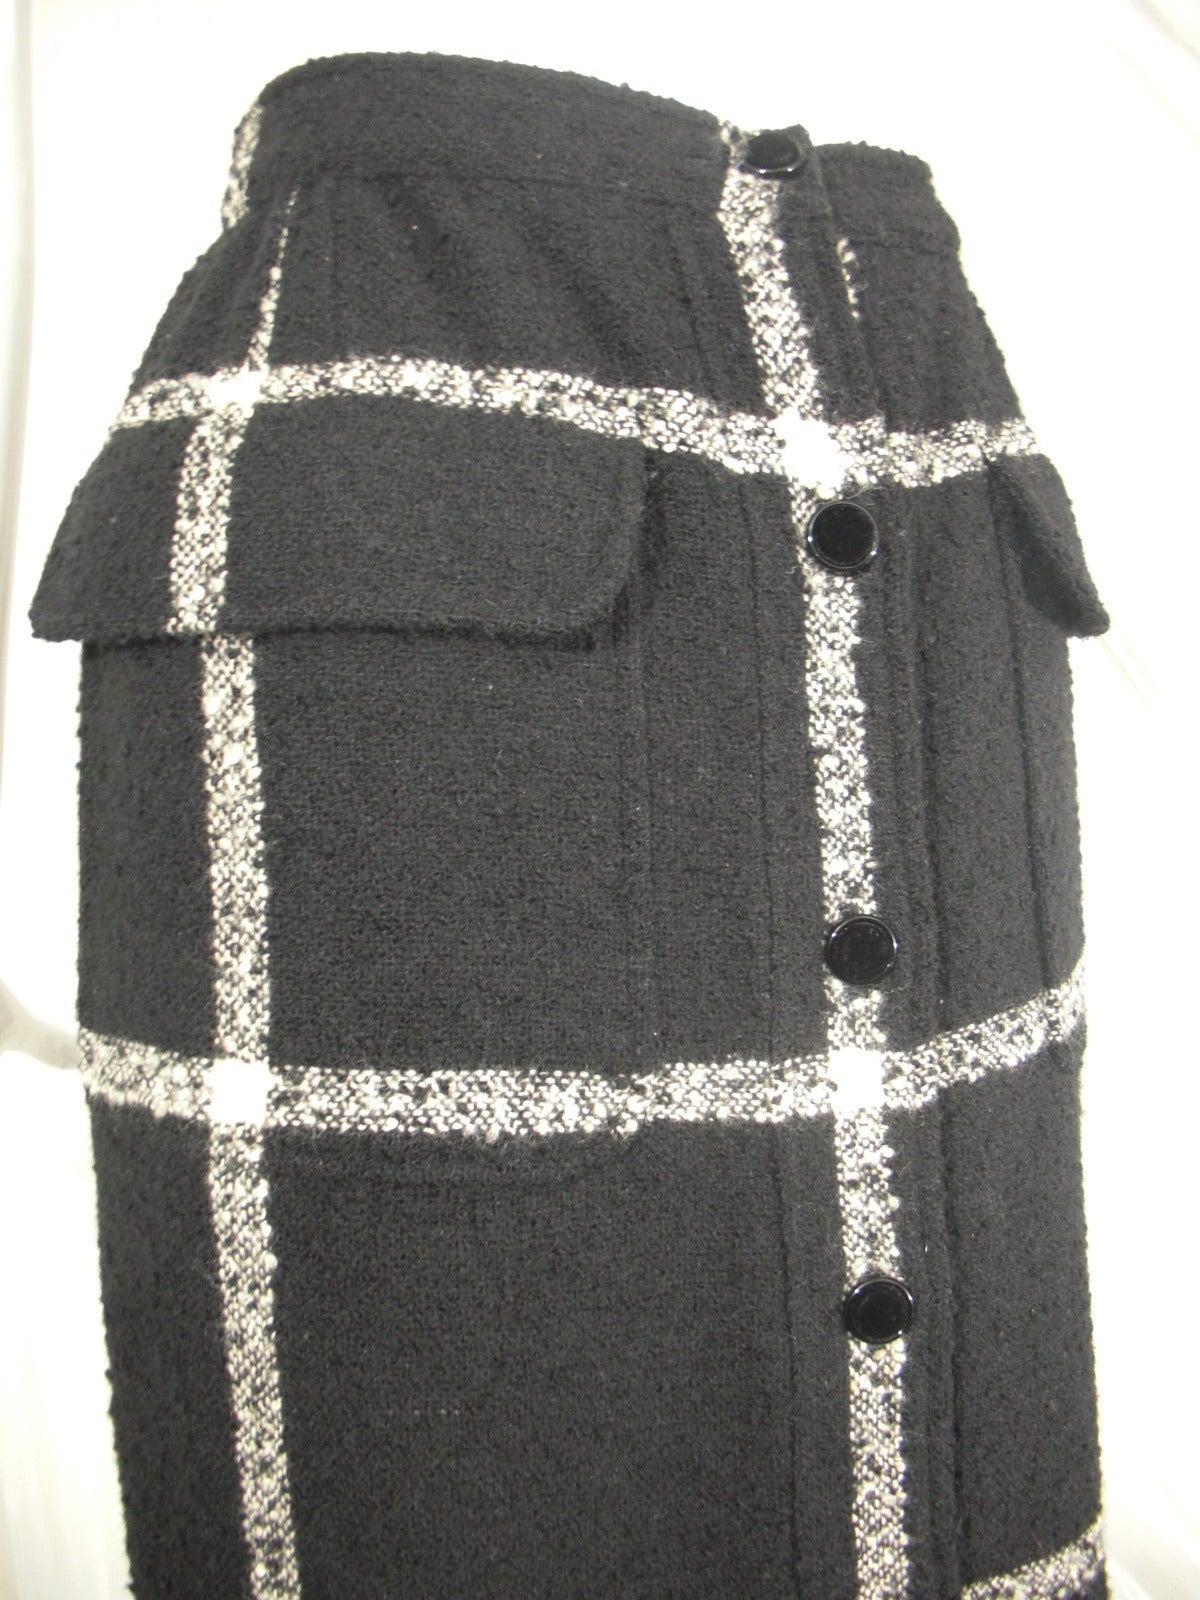 Valentino Window-Pane Wool Skirt with Button Closure and Fringe Hem 3